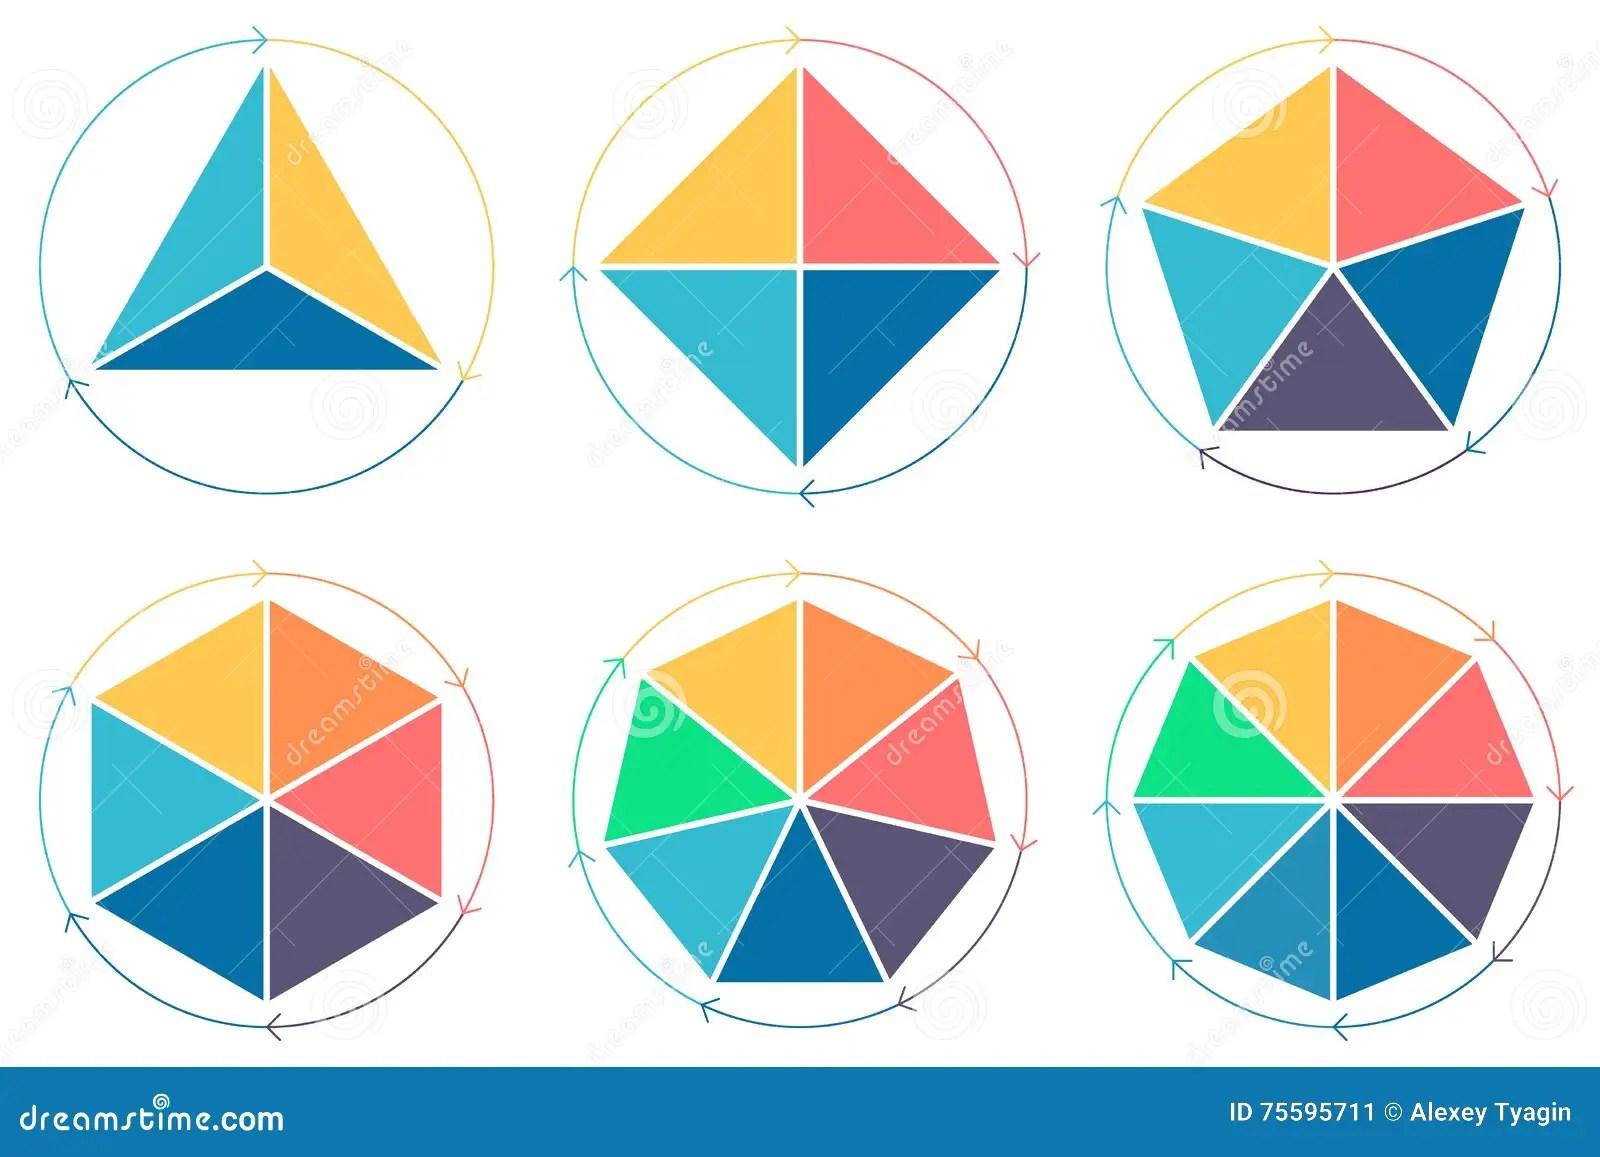 Triangle Square Pentagon Hexagon Heptagon Octagon For